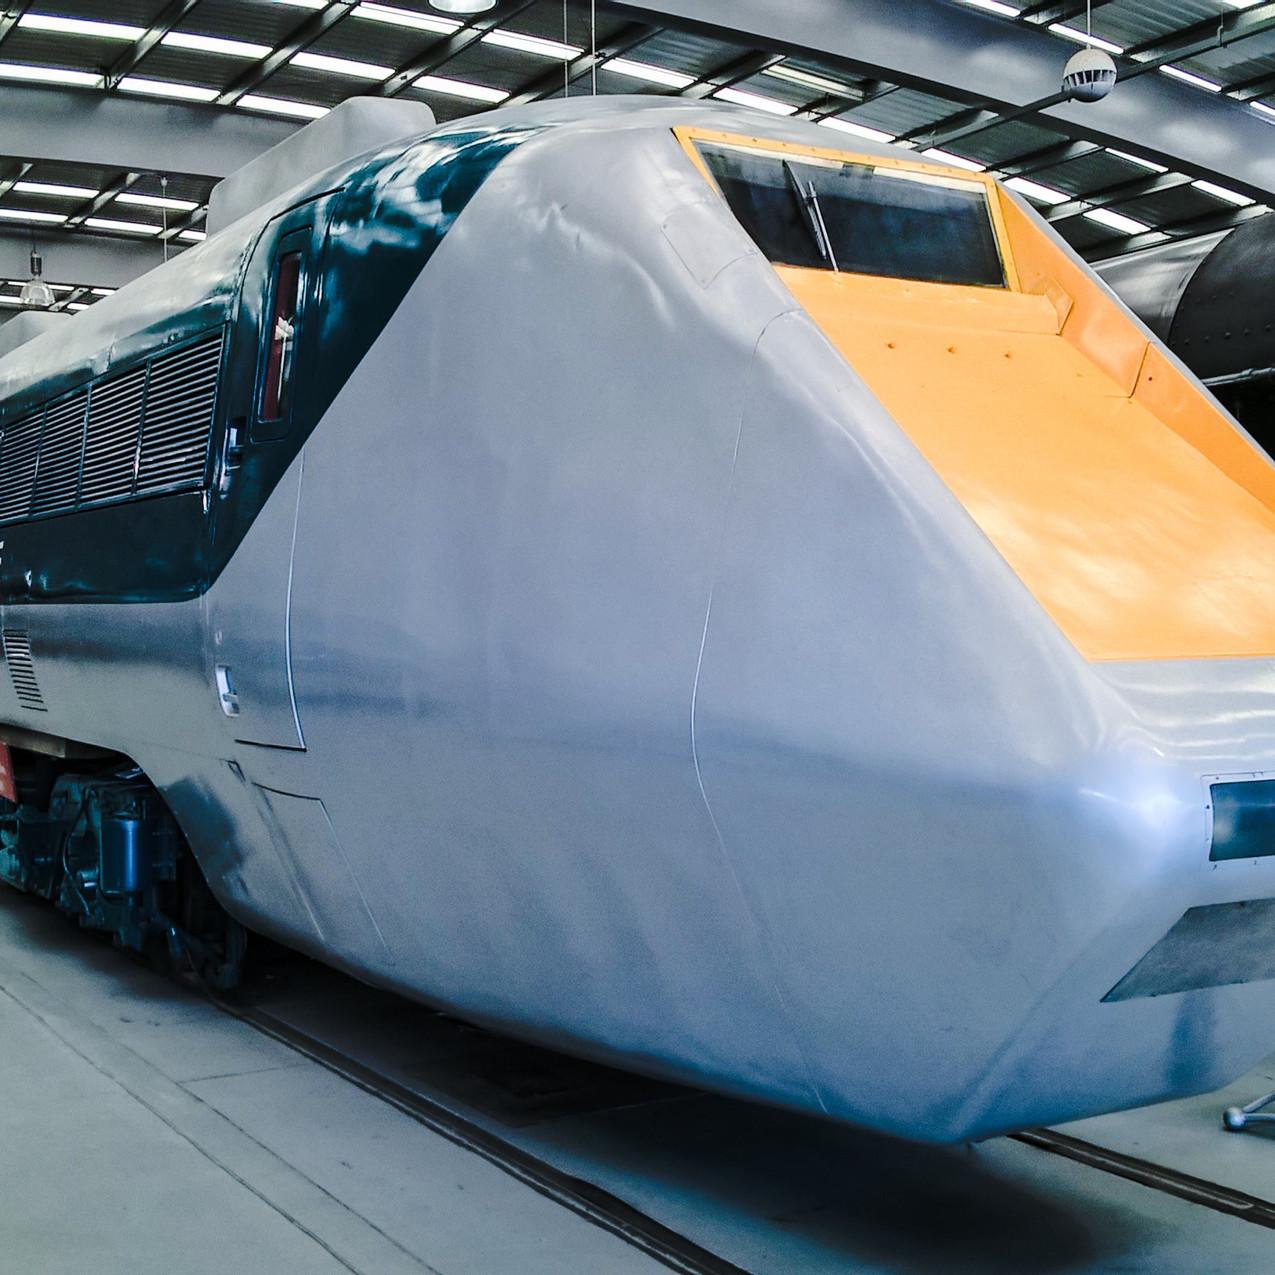 APT-E Train